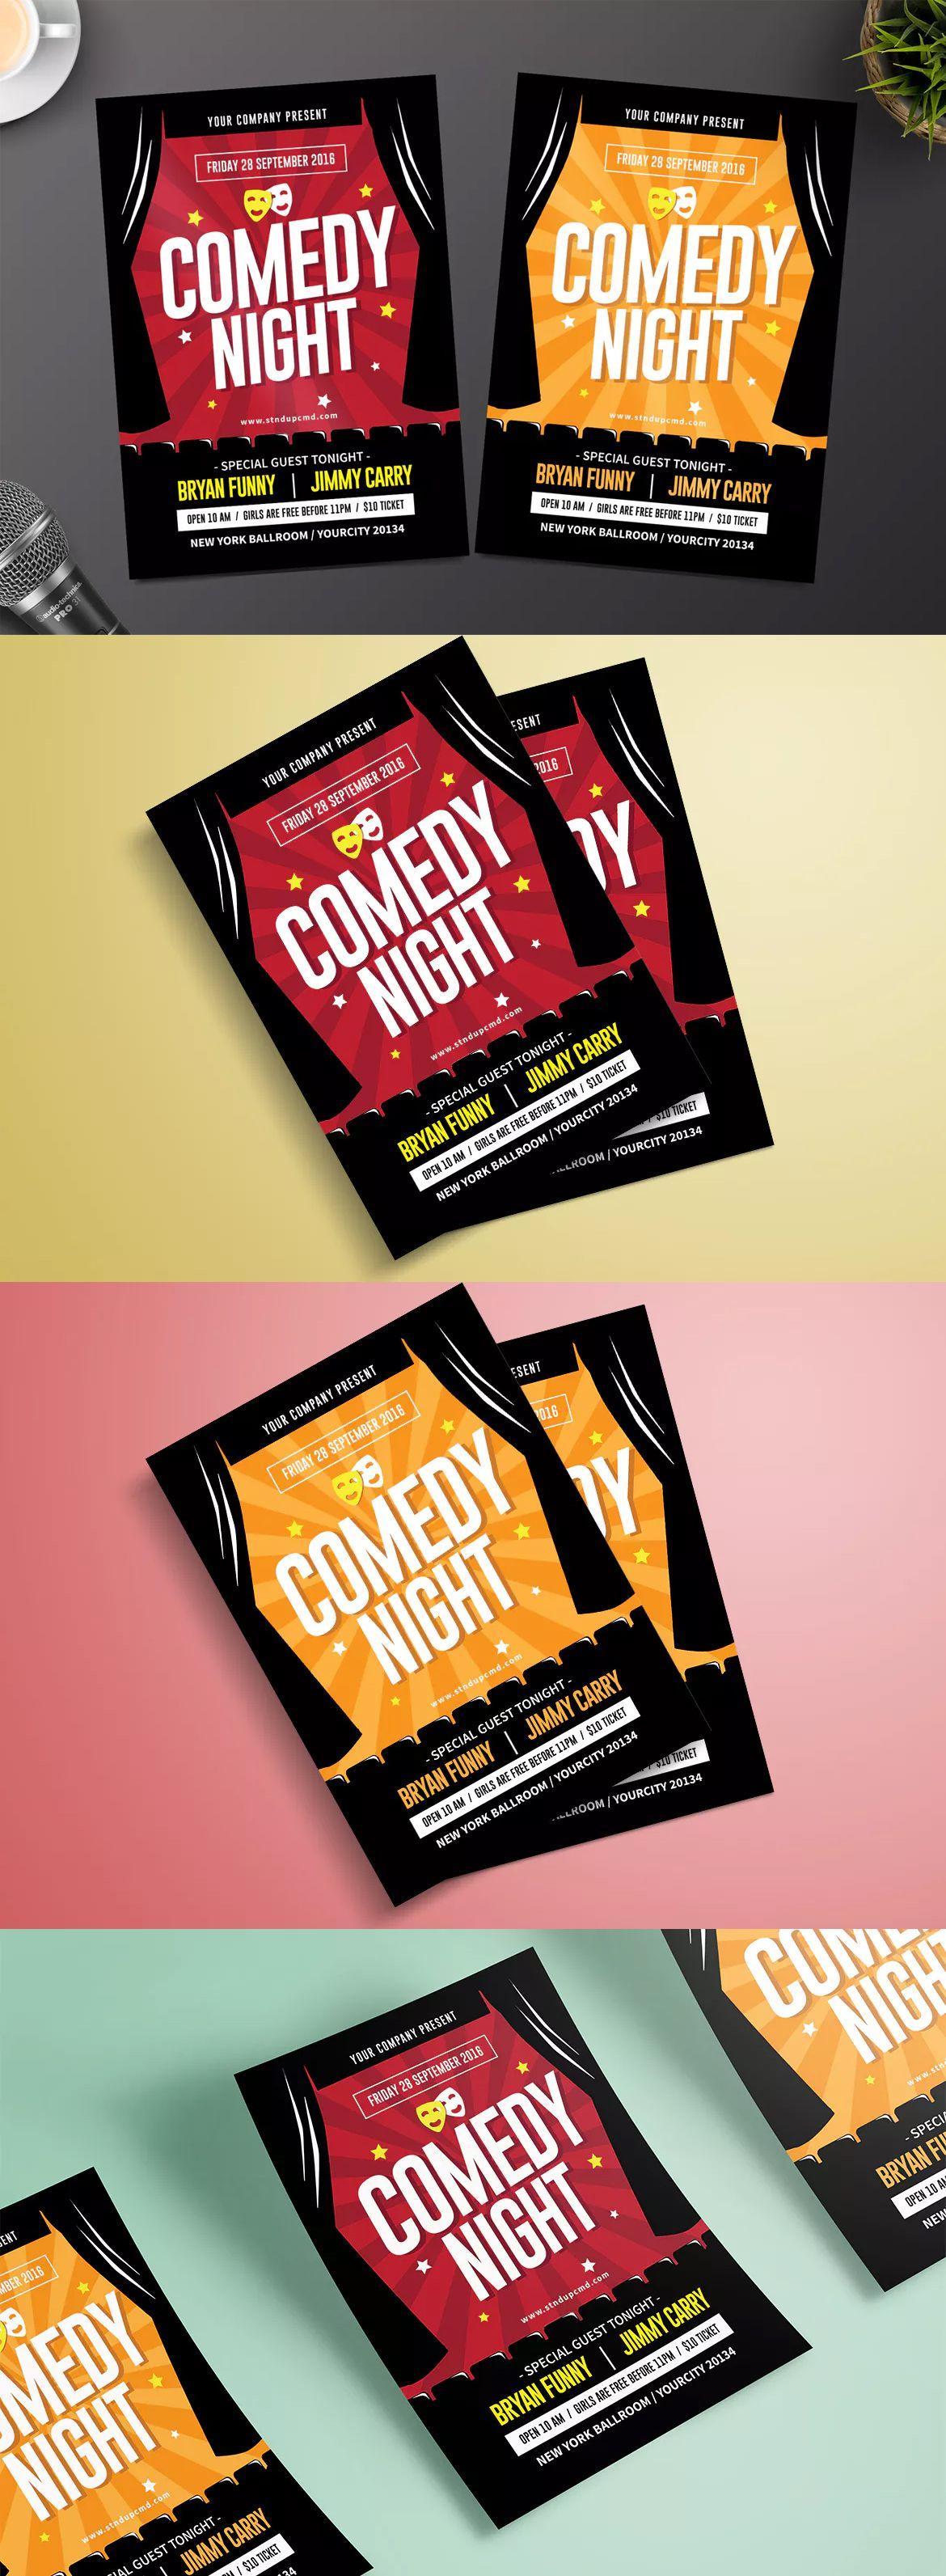 Night Comedy Flyer Template Ai Psd Flyer Design Templates